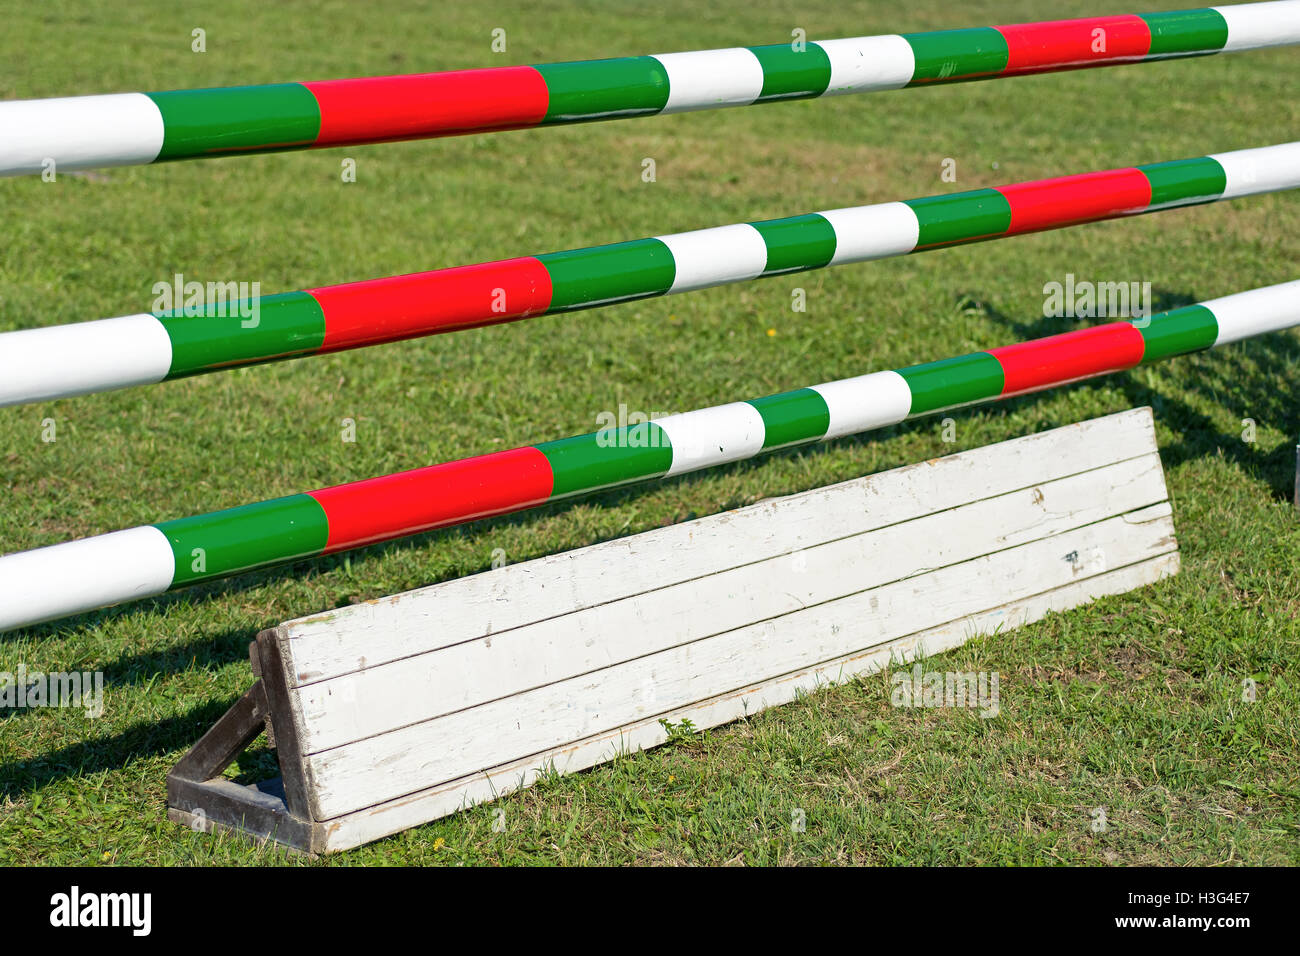 Horse Jumping Hurdle. Equestrian Sports. - Stock Image